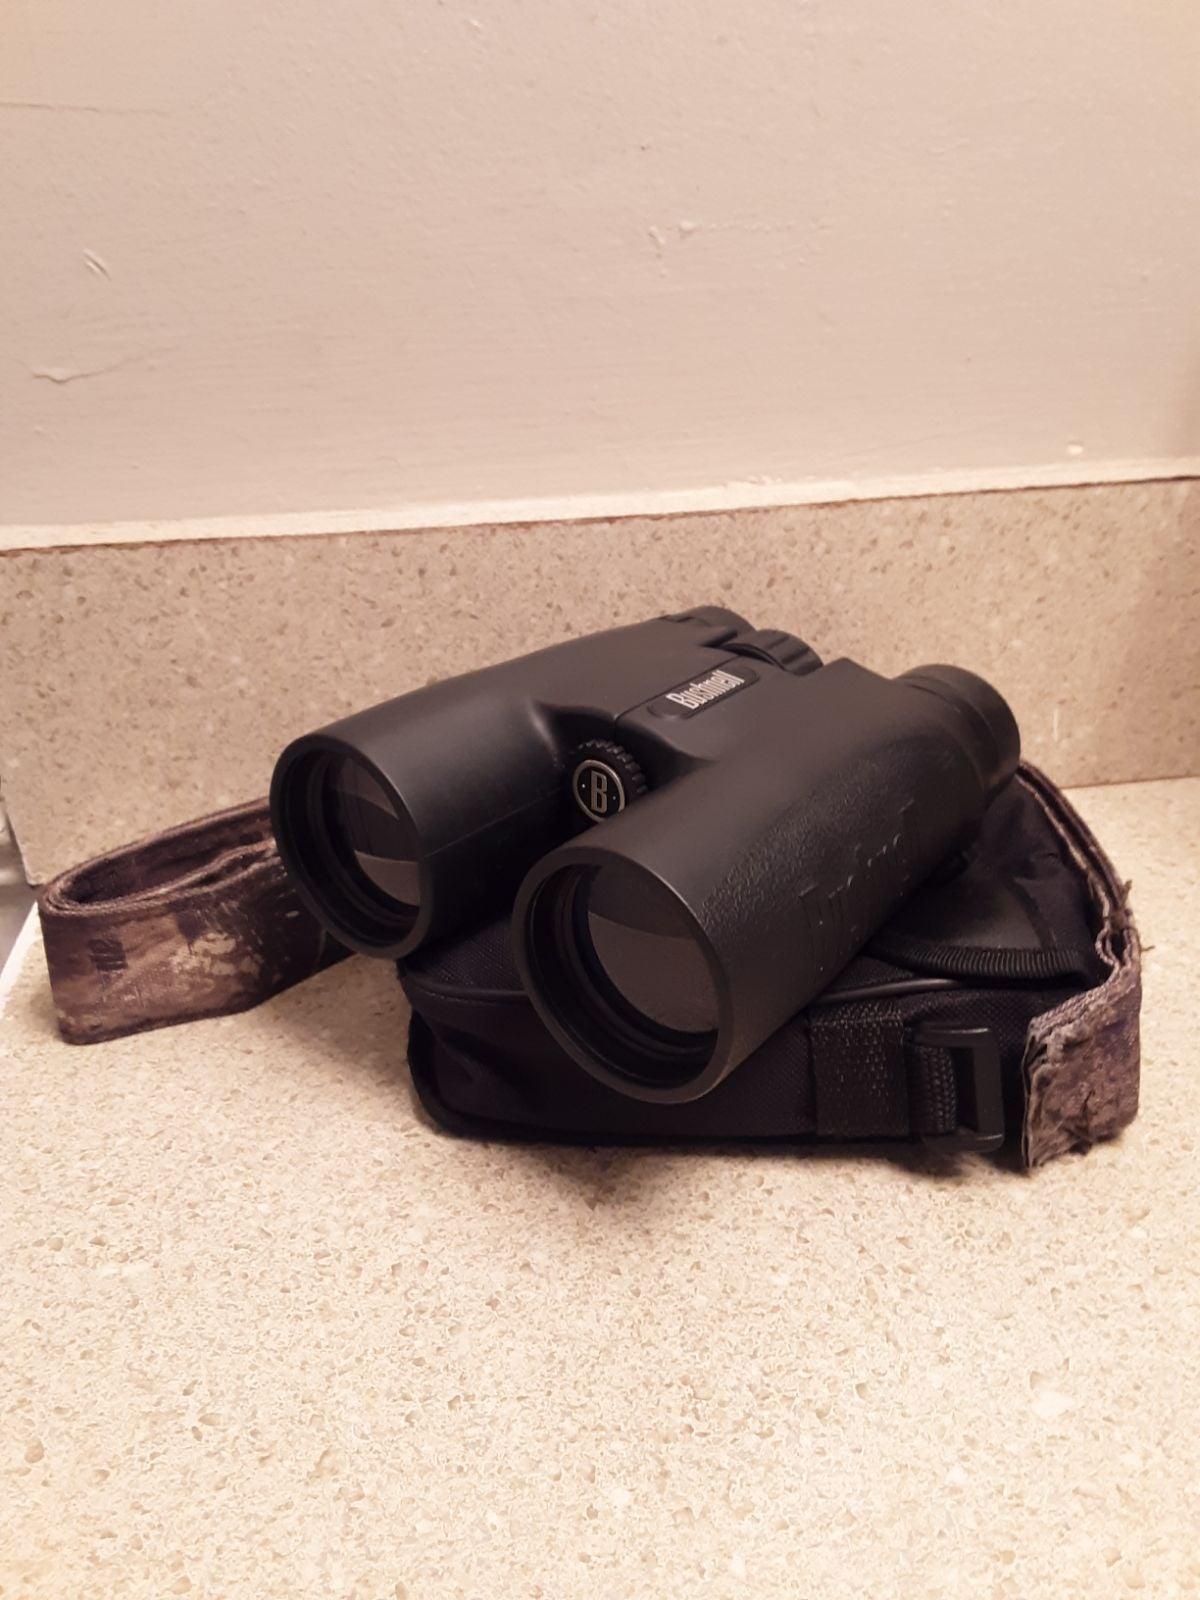 Bushnell Pacifica binoculars